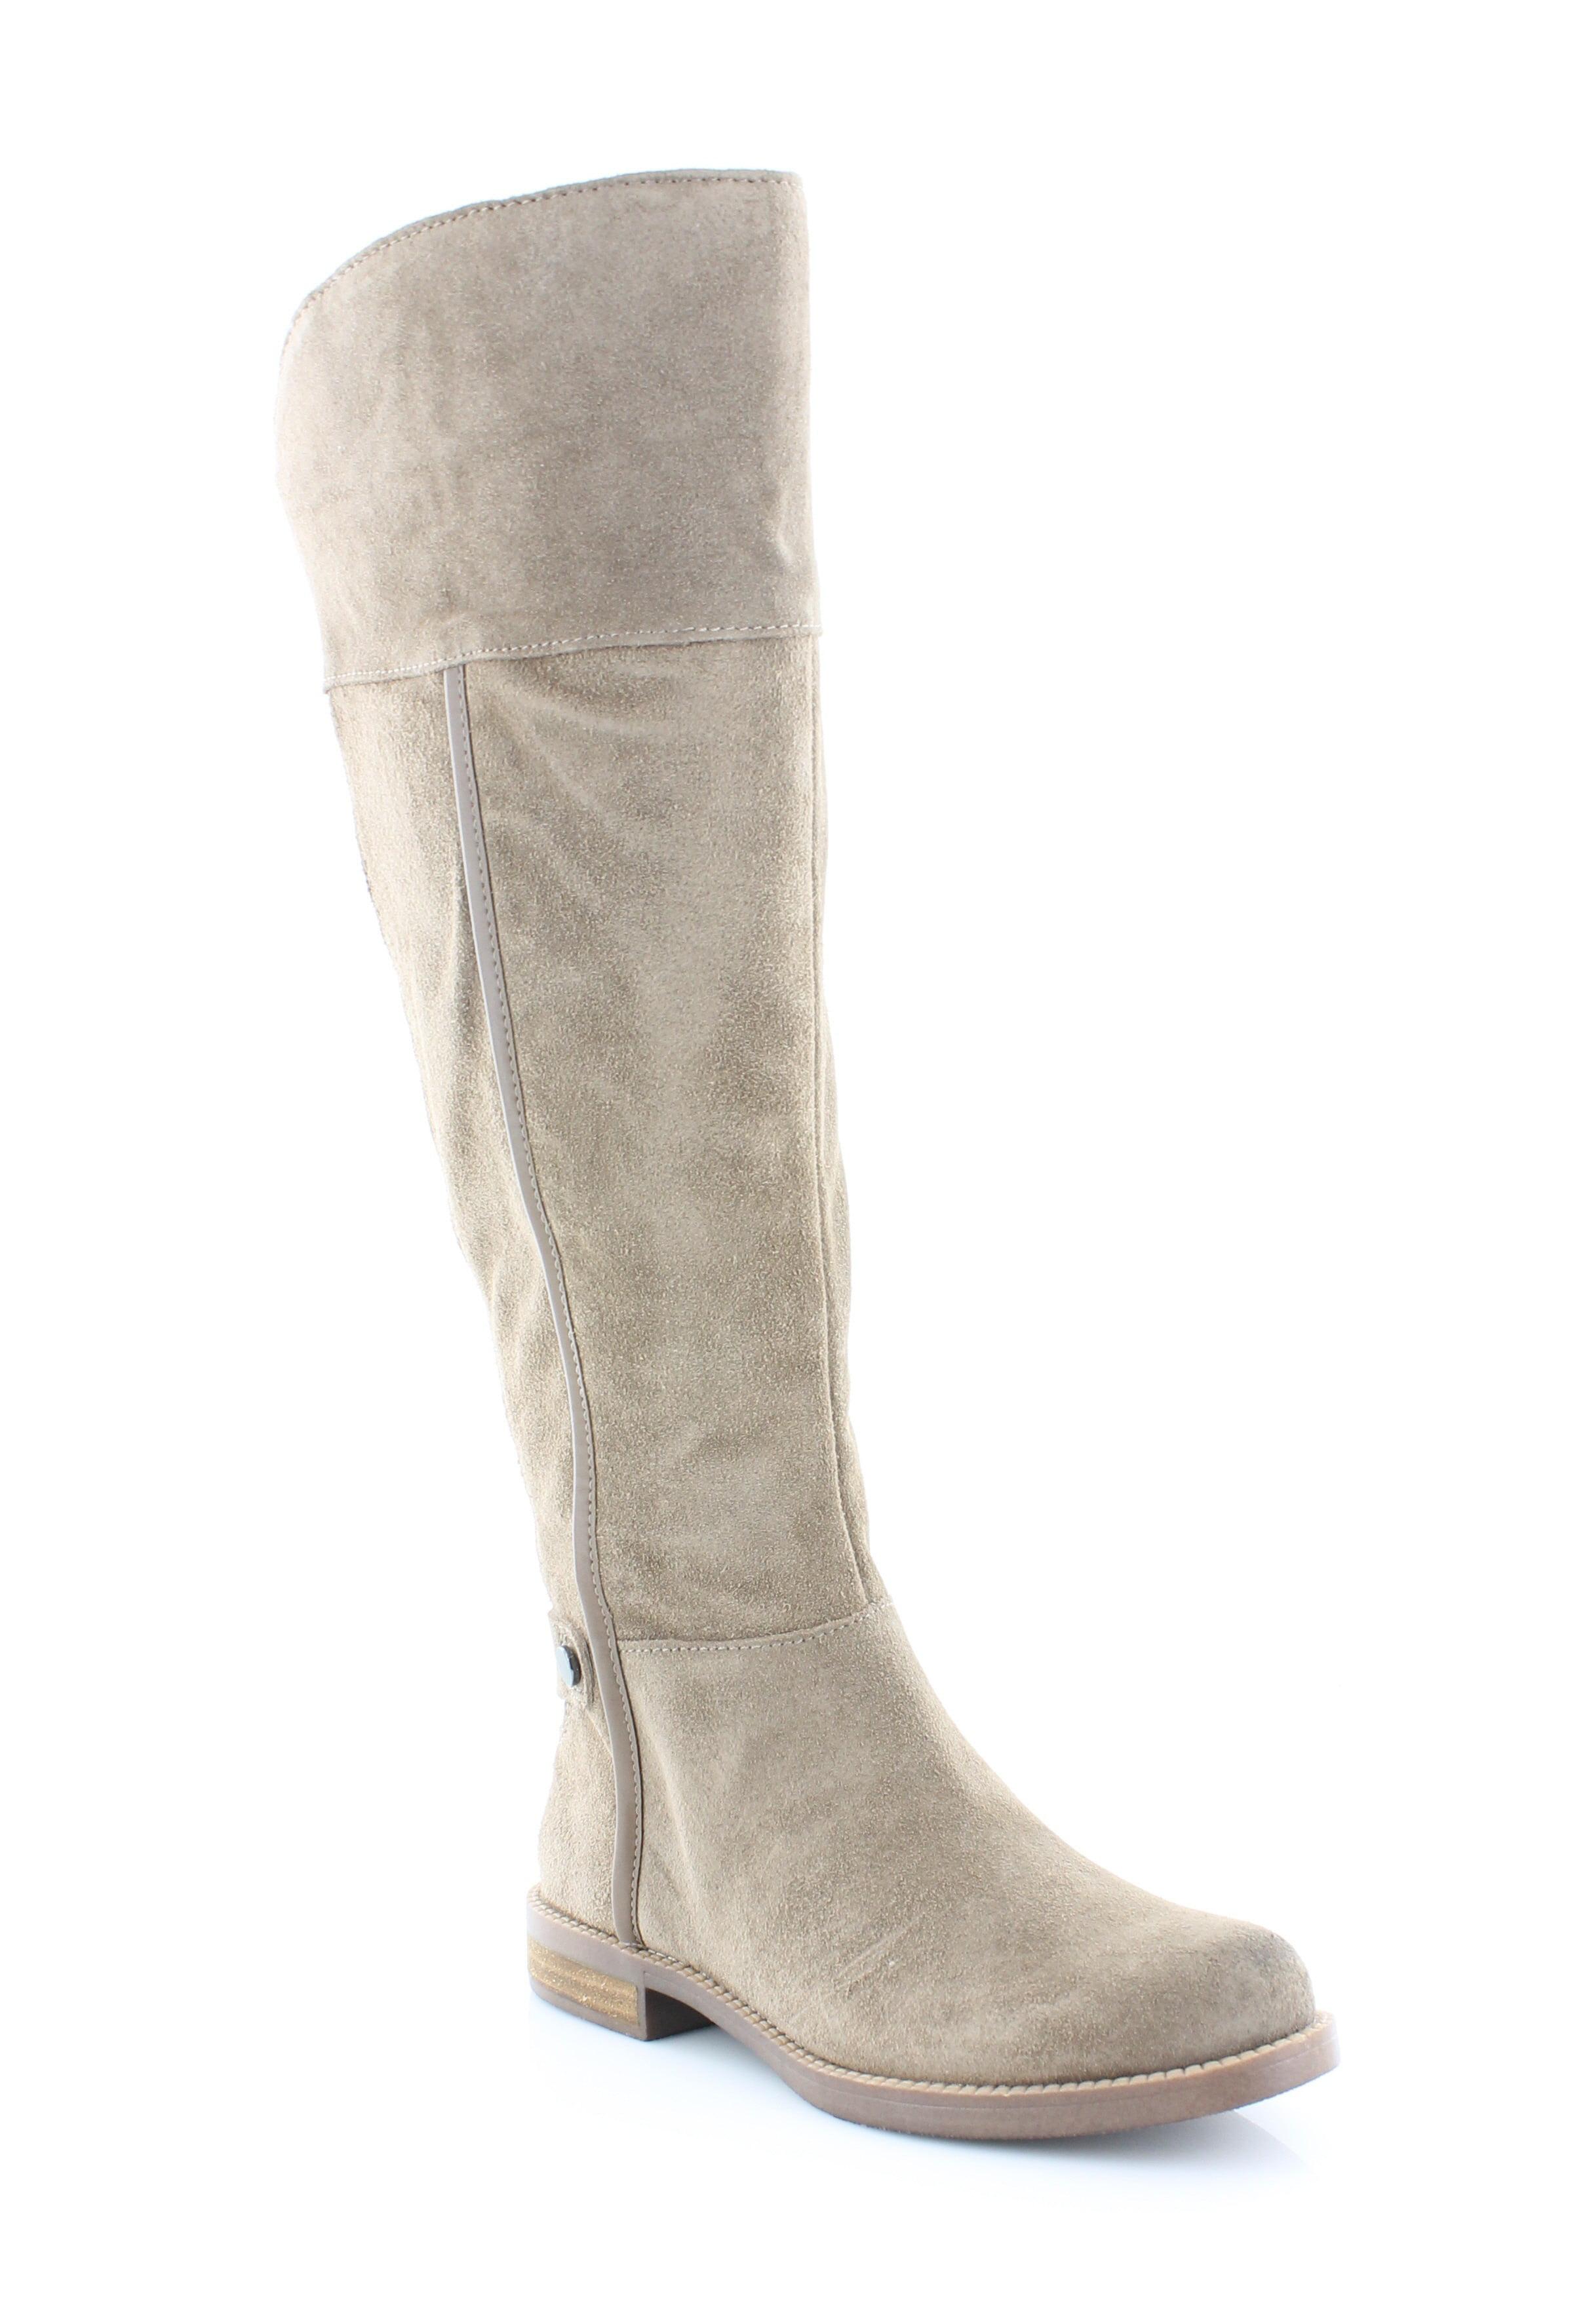 Franco Sarto Caydee Women's Boots by